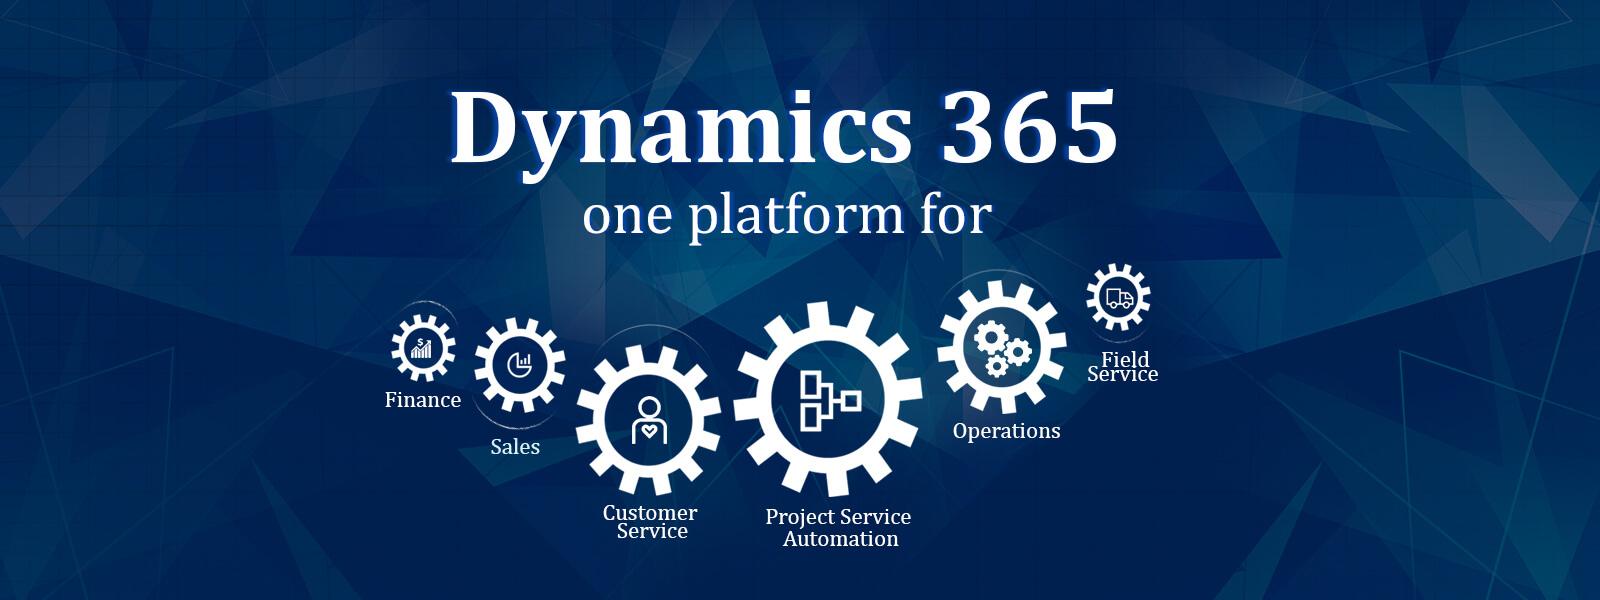 NavisionIndia - Top Microsoft Dynamics 365, Business Central